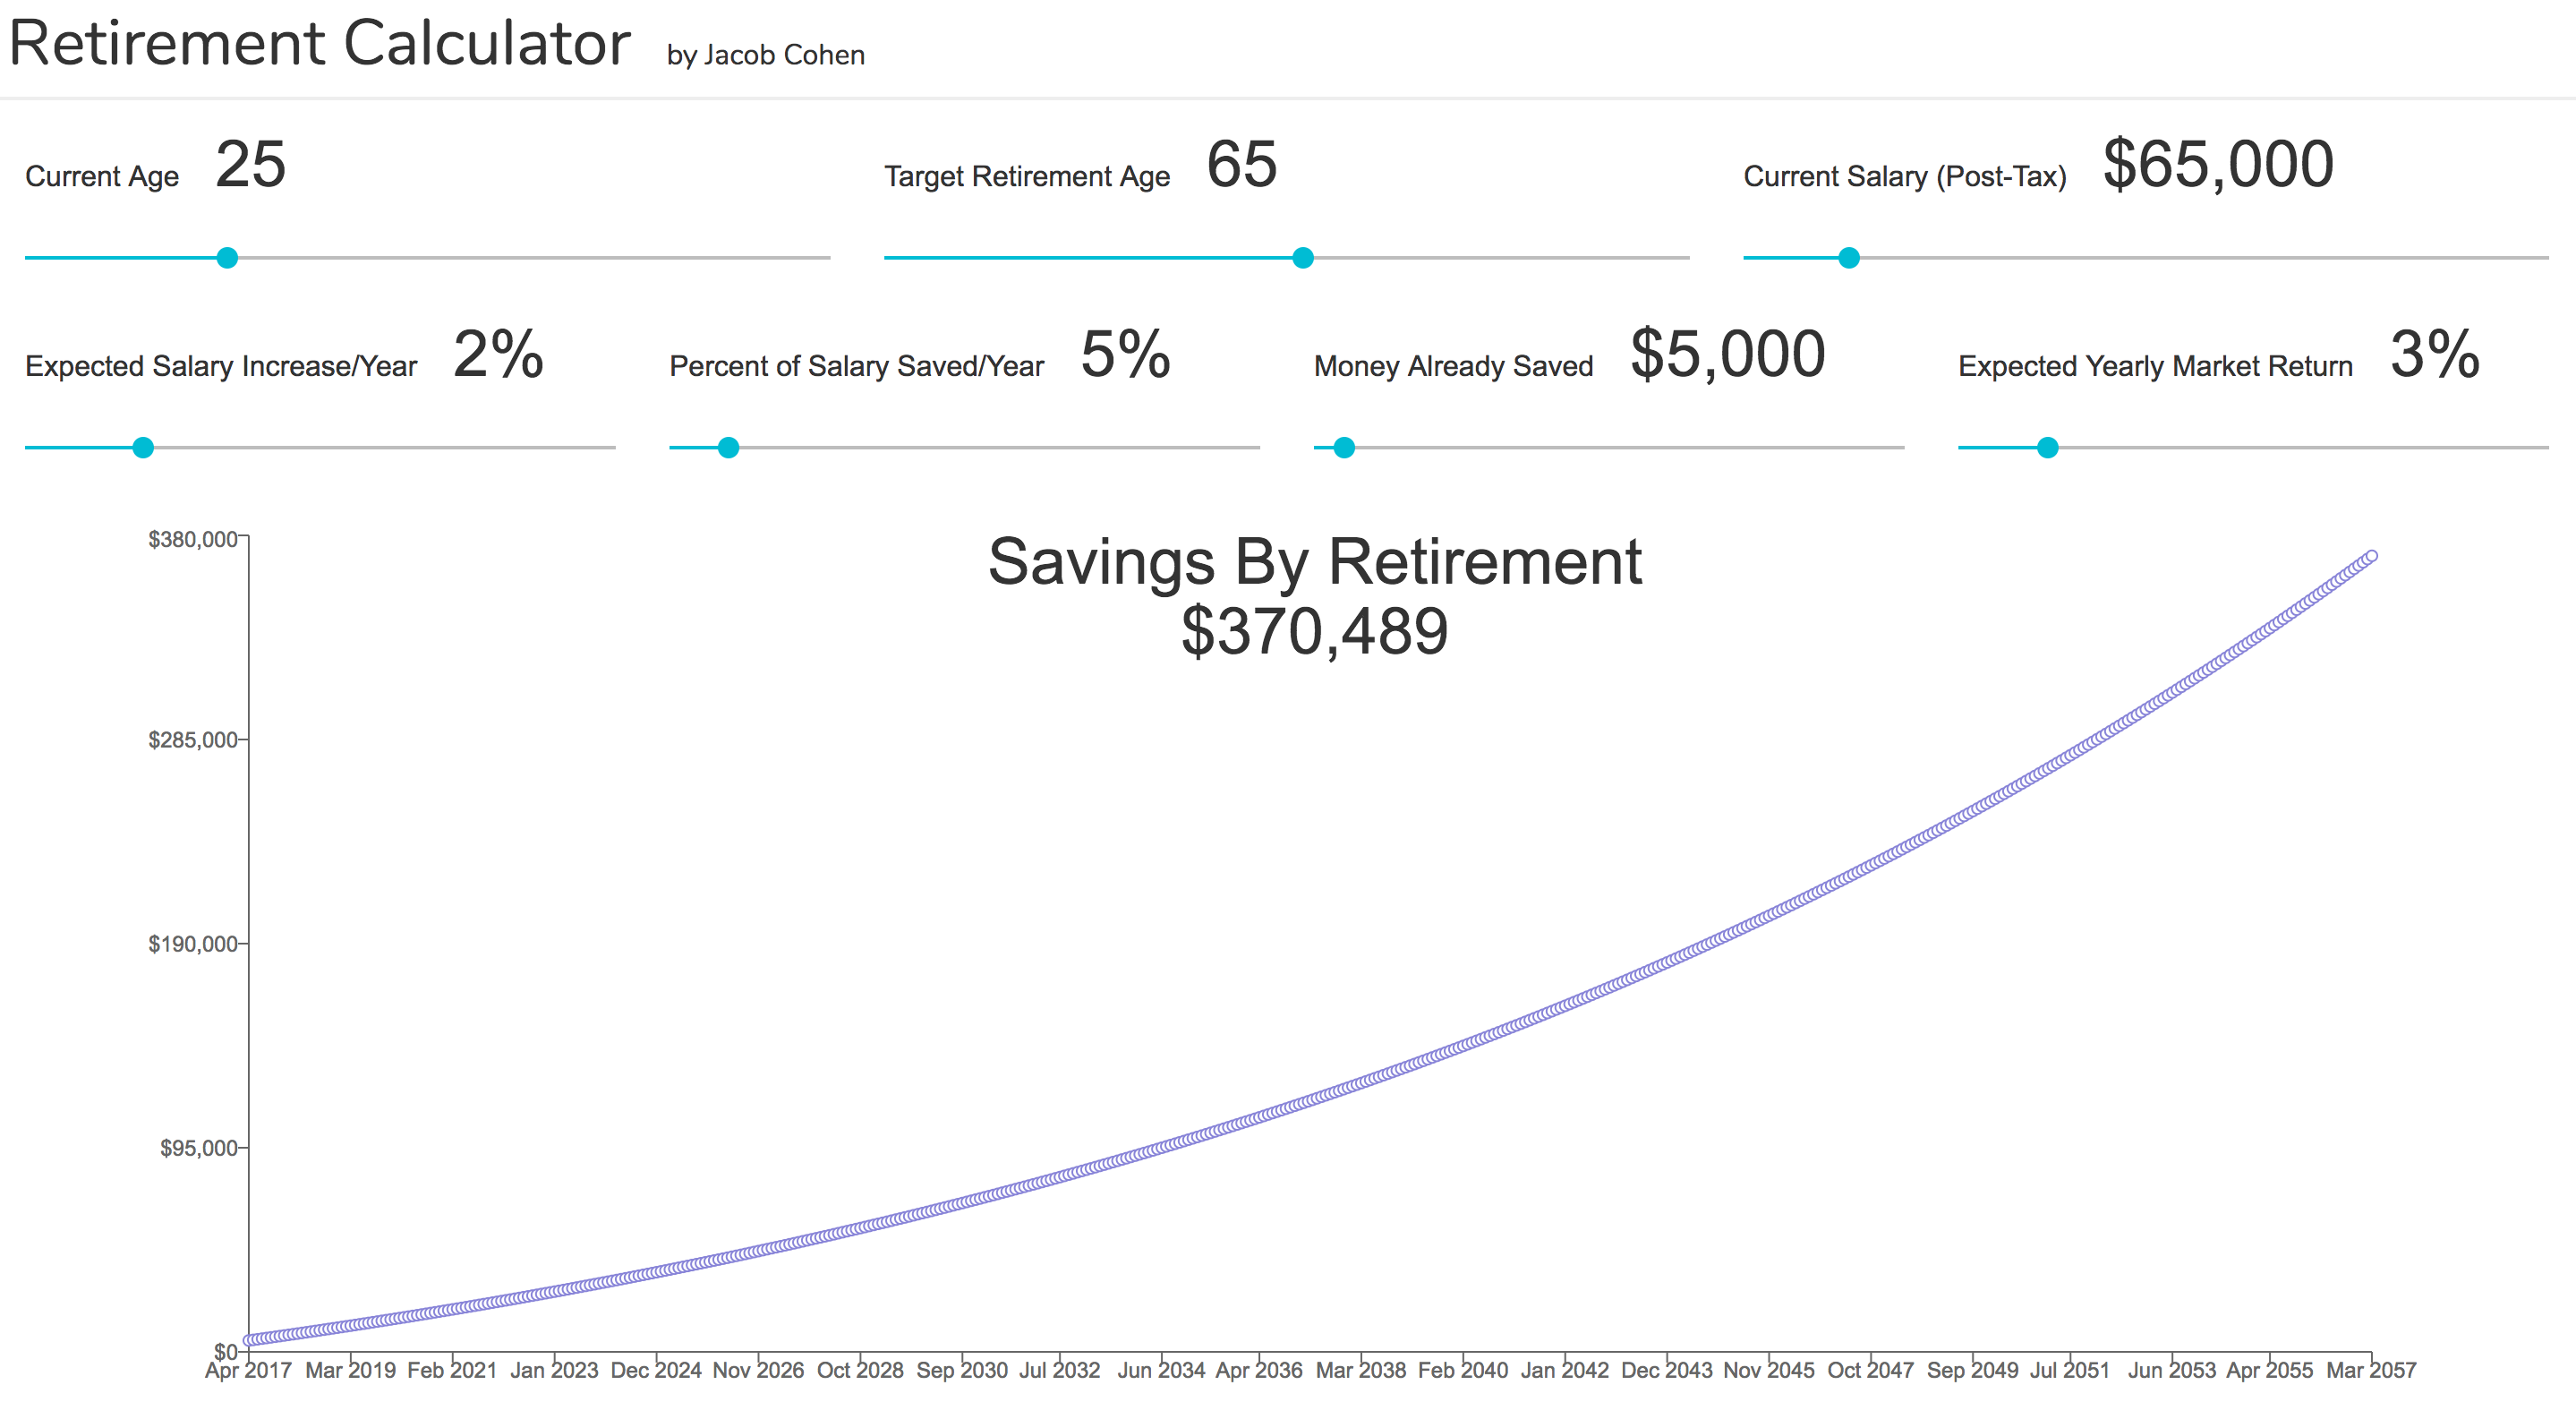 Basic Retirement Calculator